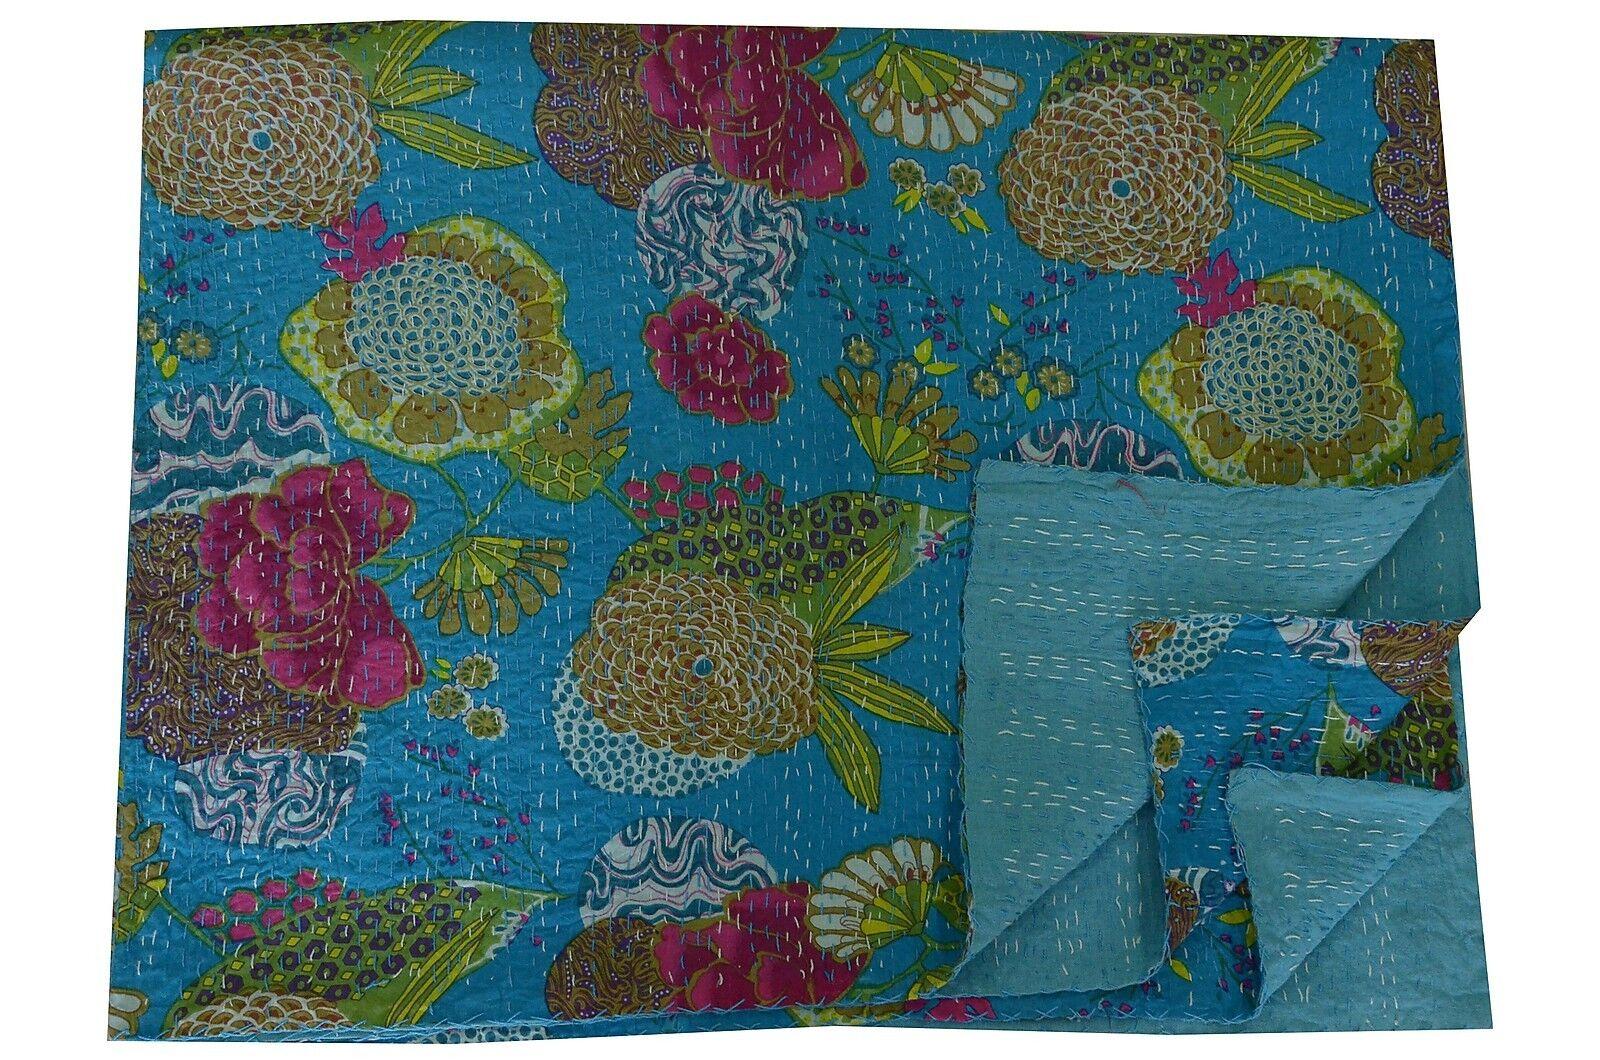 Indian Kantha Quilt Floral Bedspread Throw Cotton Blanket Turquoise Gudari Decor